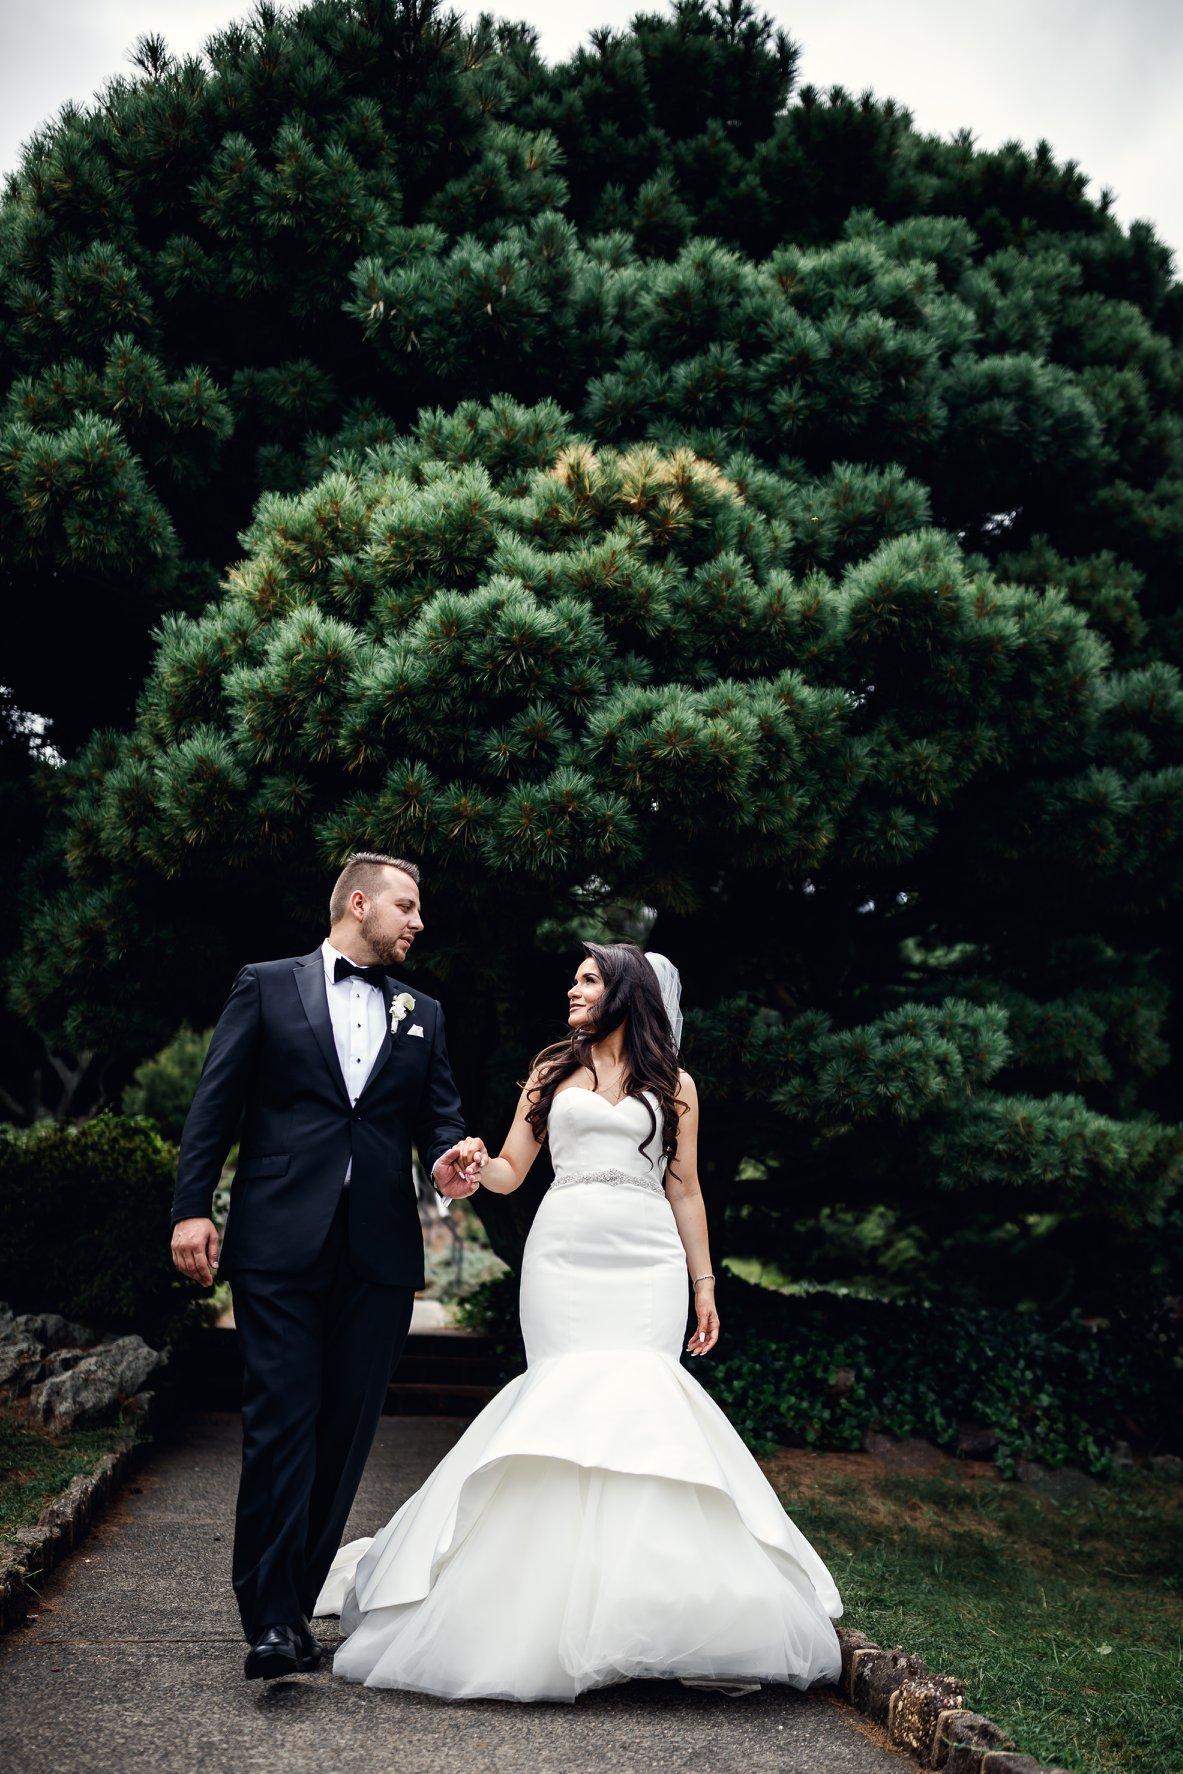 zajac photography wedding 19b